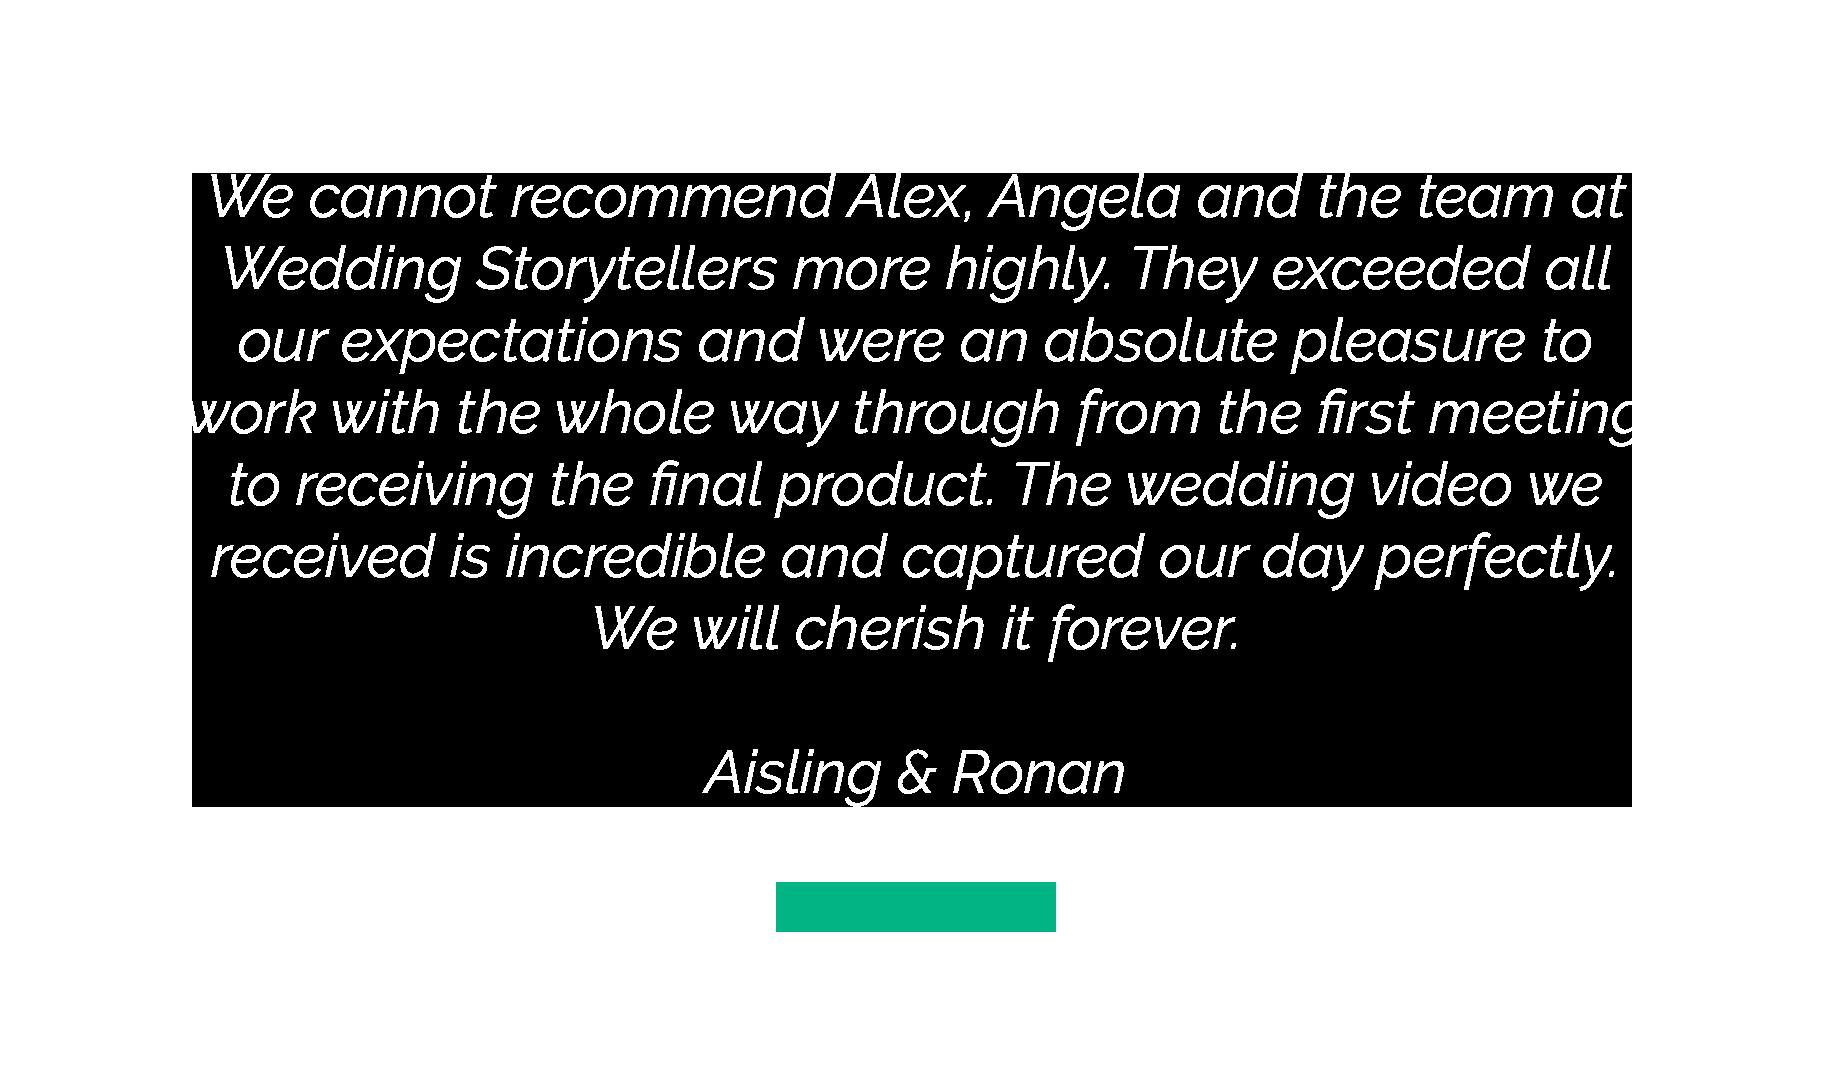 Aisling-&-Ronan.png